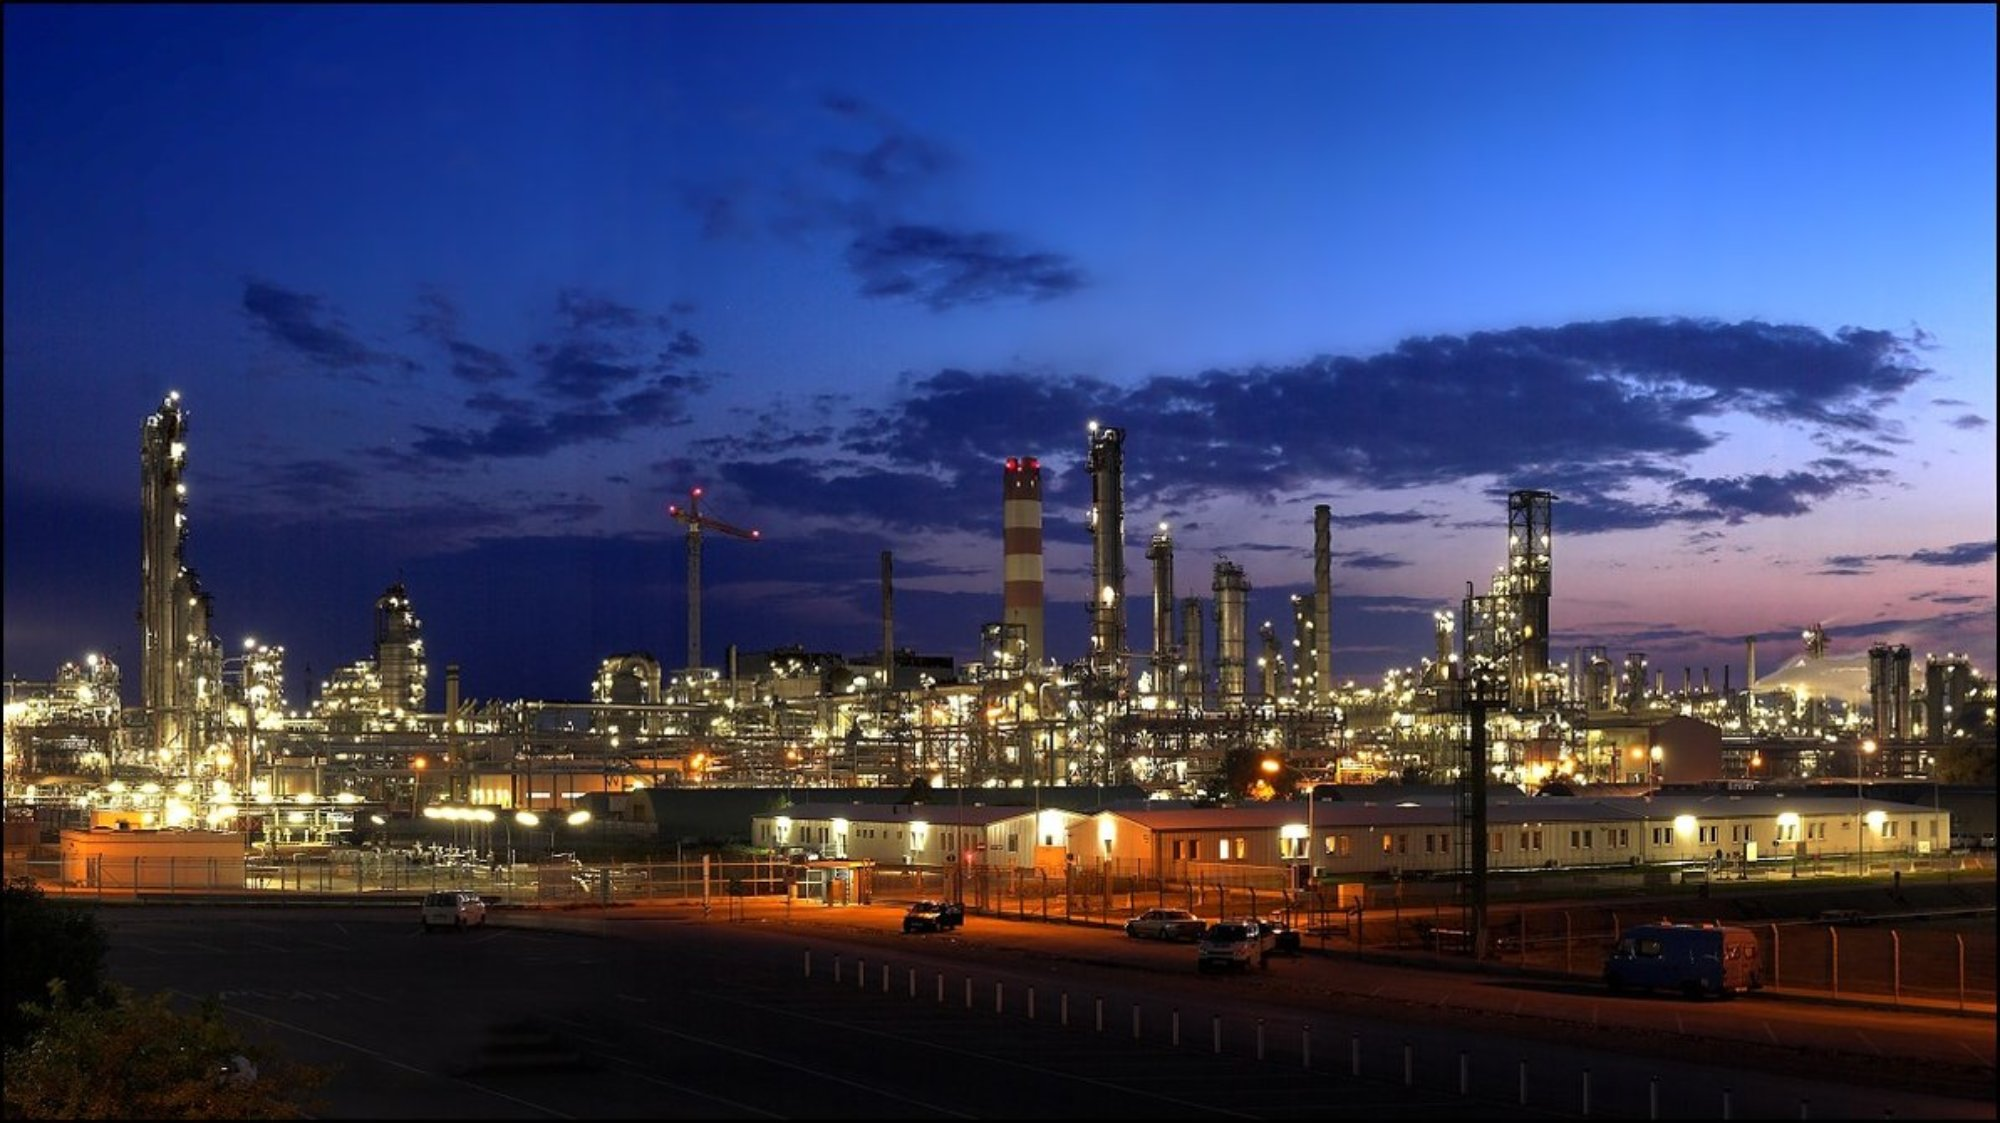 corpus christi refinery